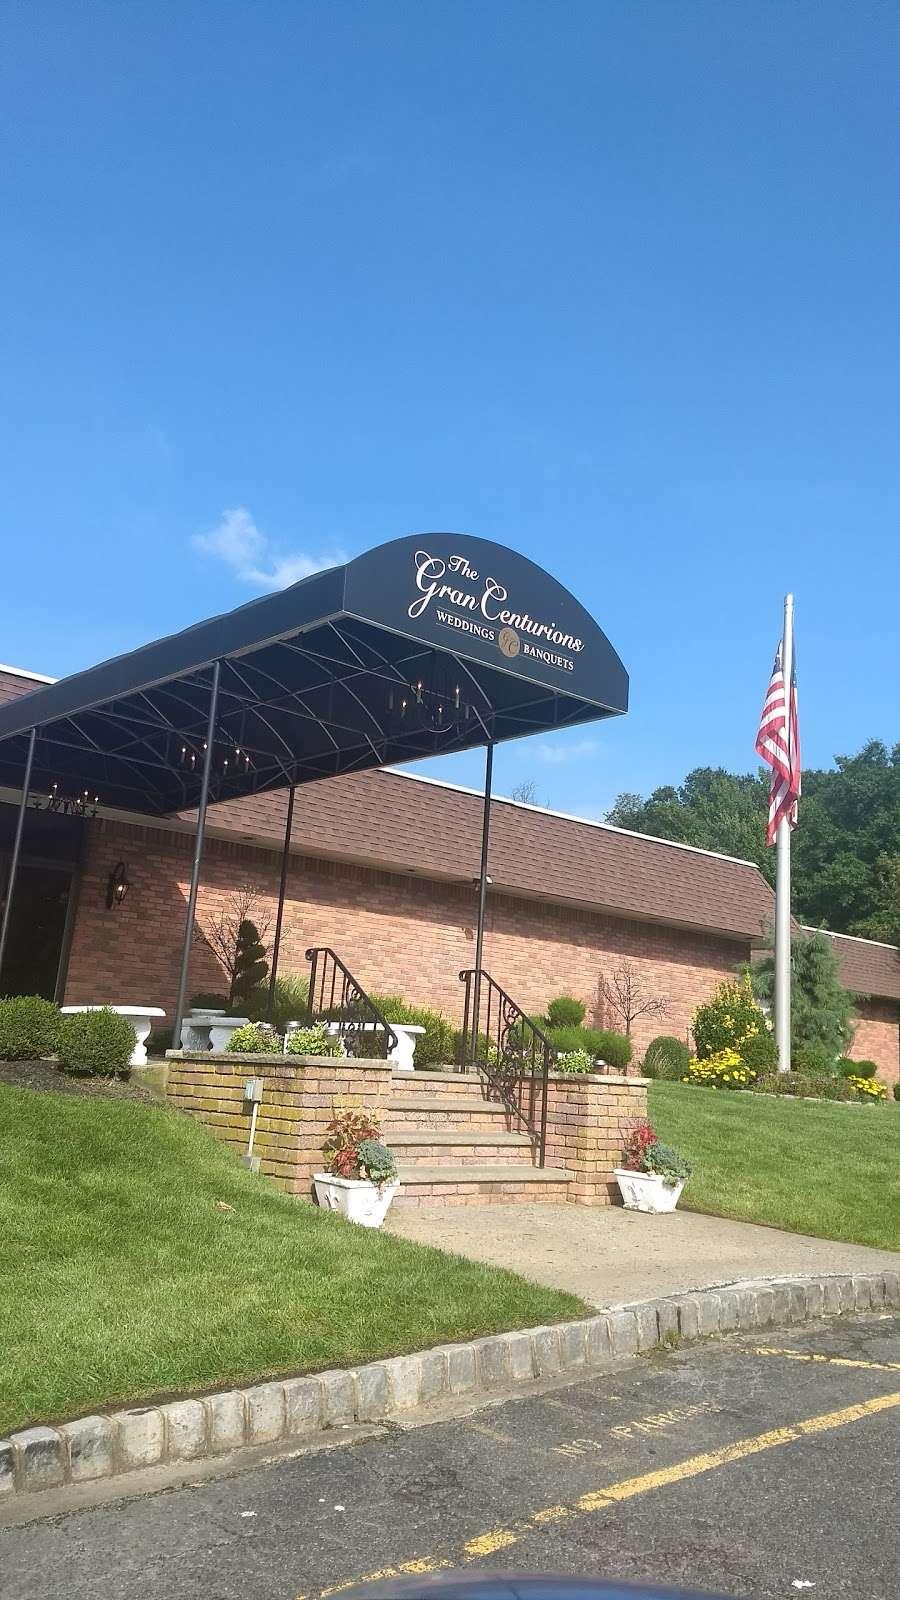 Gran Centurions - restaurant  | Photo 10 of 10 | Address: 440 Madison Hill Rd, Clark, NJ 07066, USA | Phone: (732) 382-1664